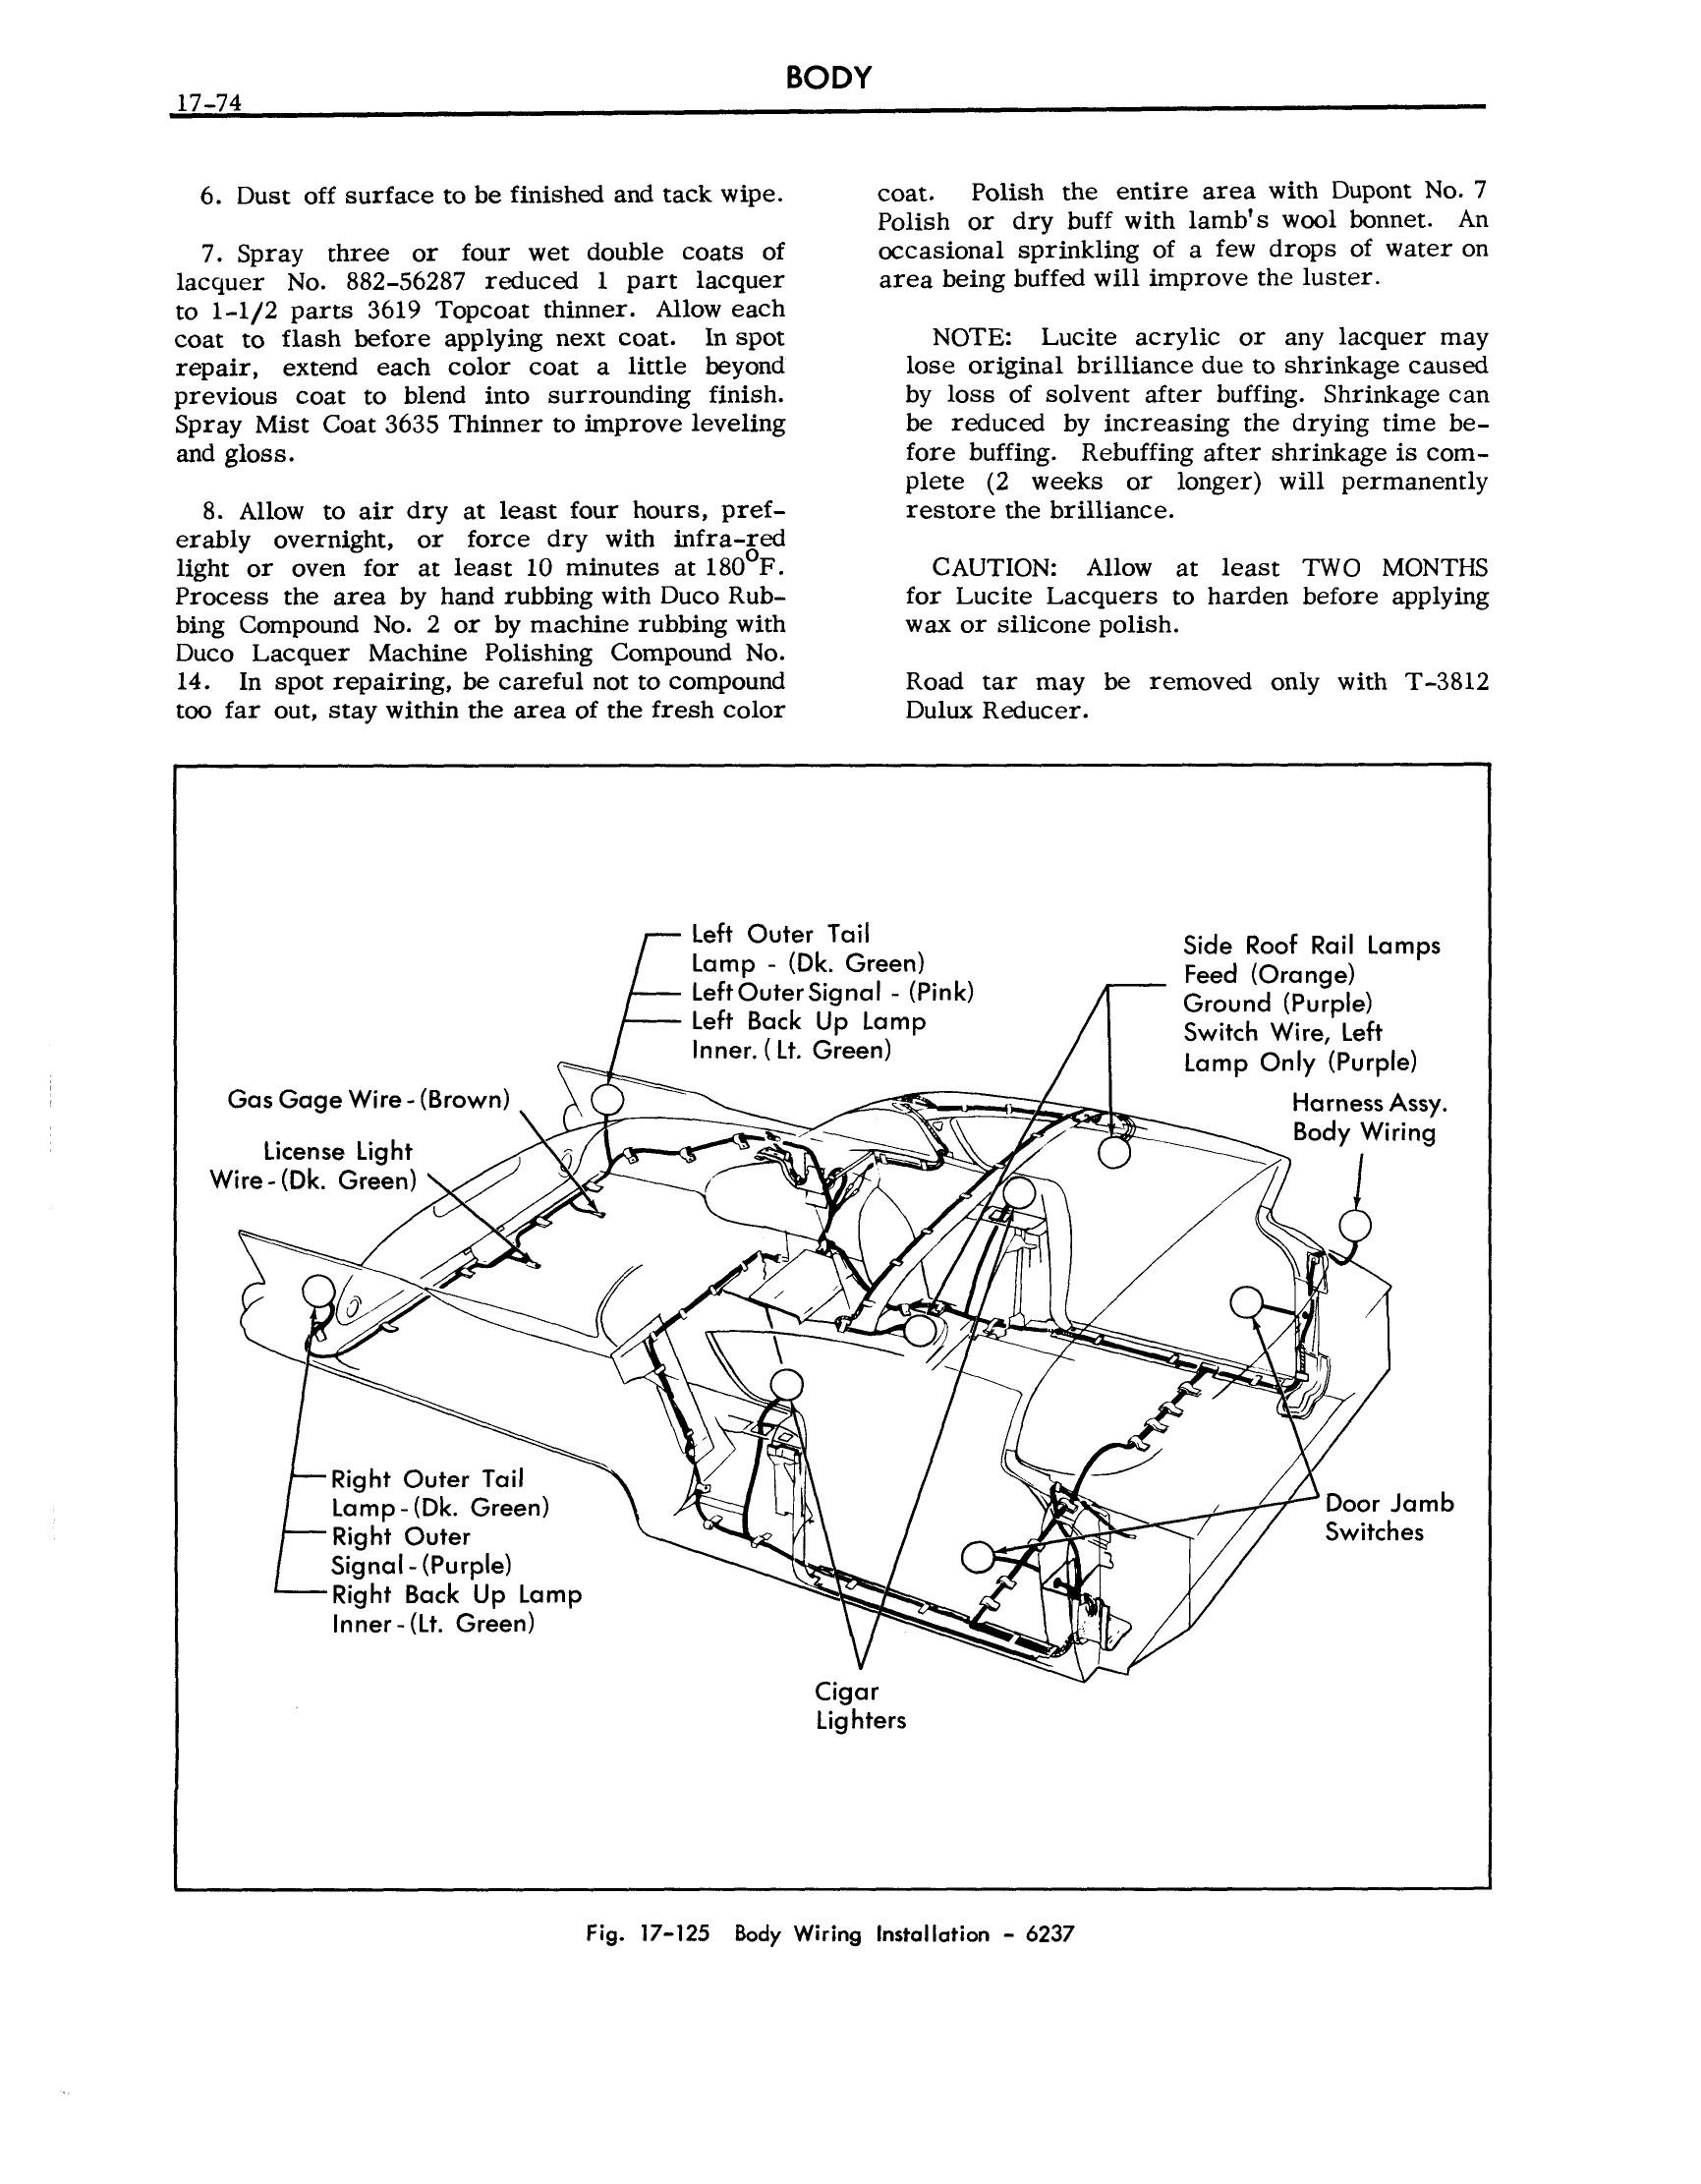 1957 Cadillac Shop Manual- Body Page 74 of 76